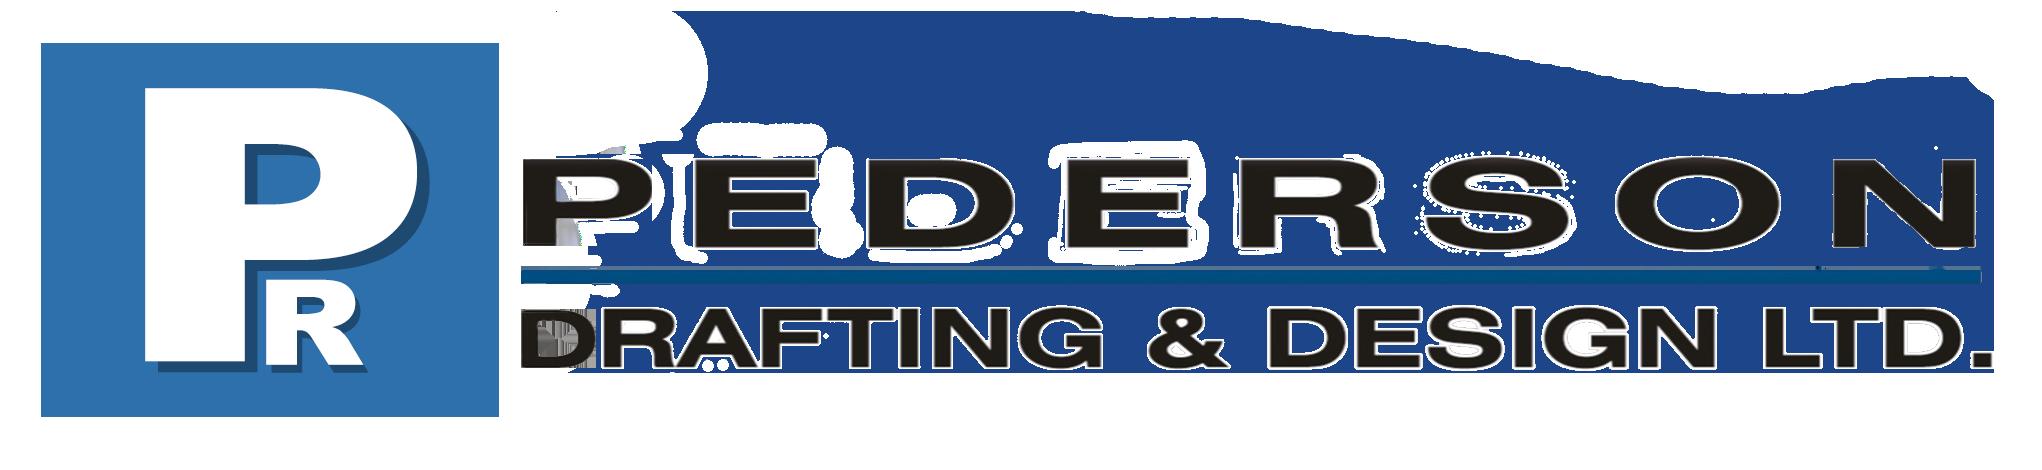 Pederson Drafting & Design Ltd.